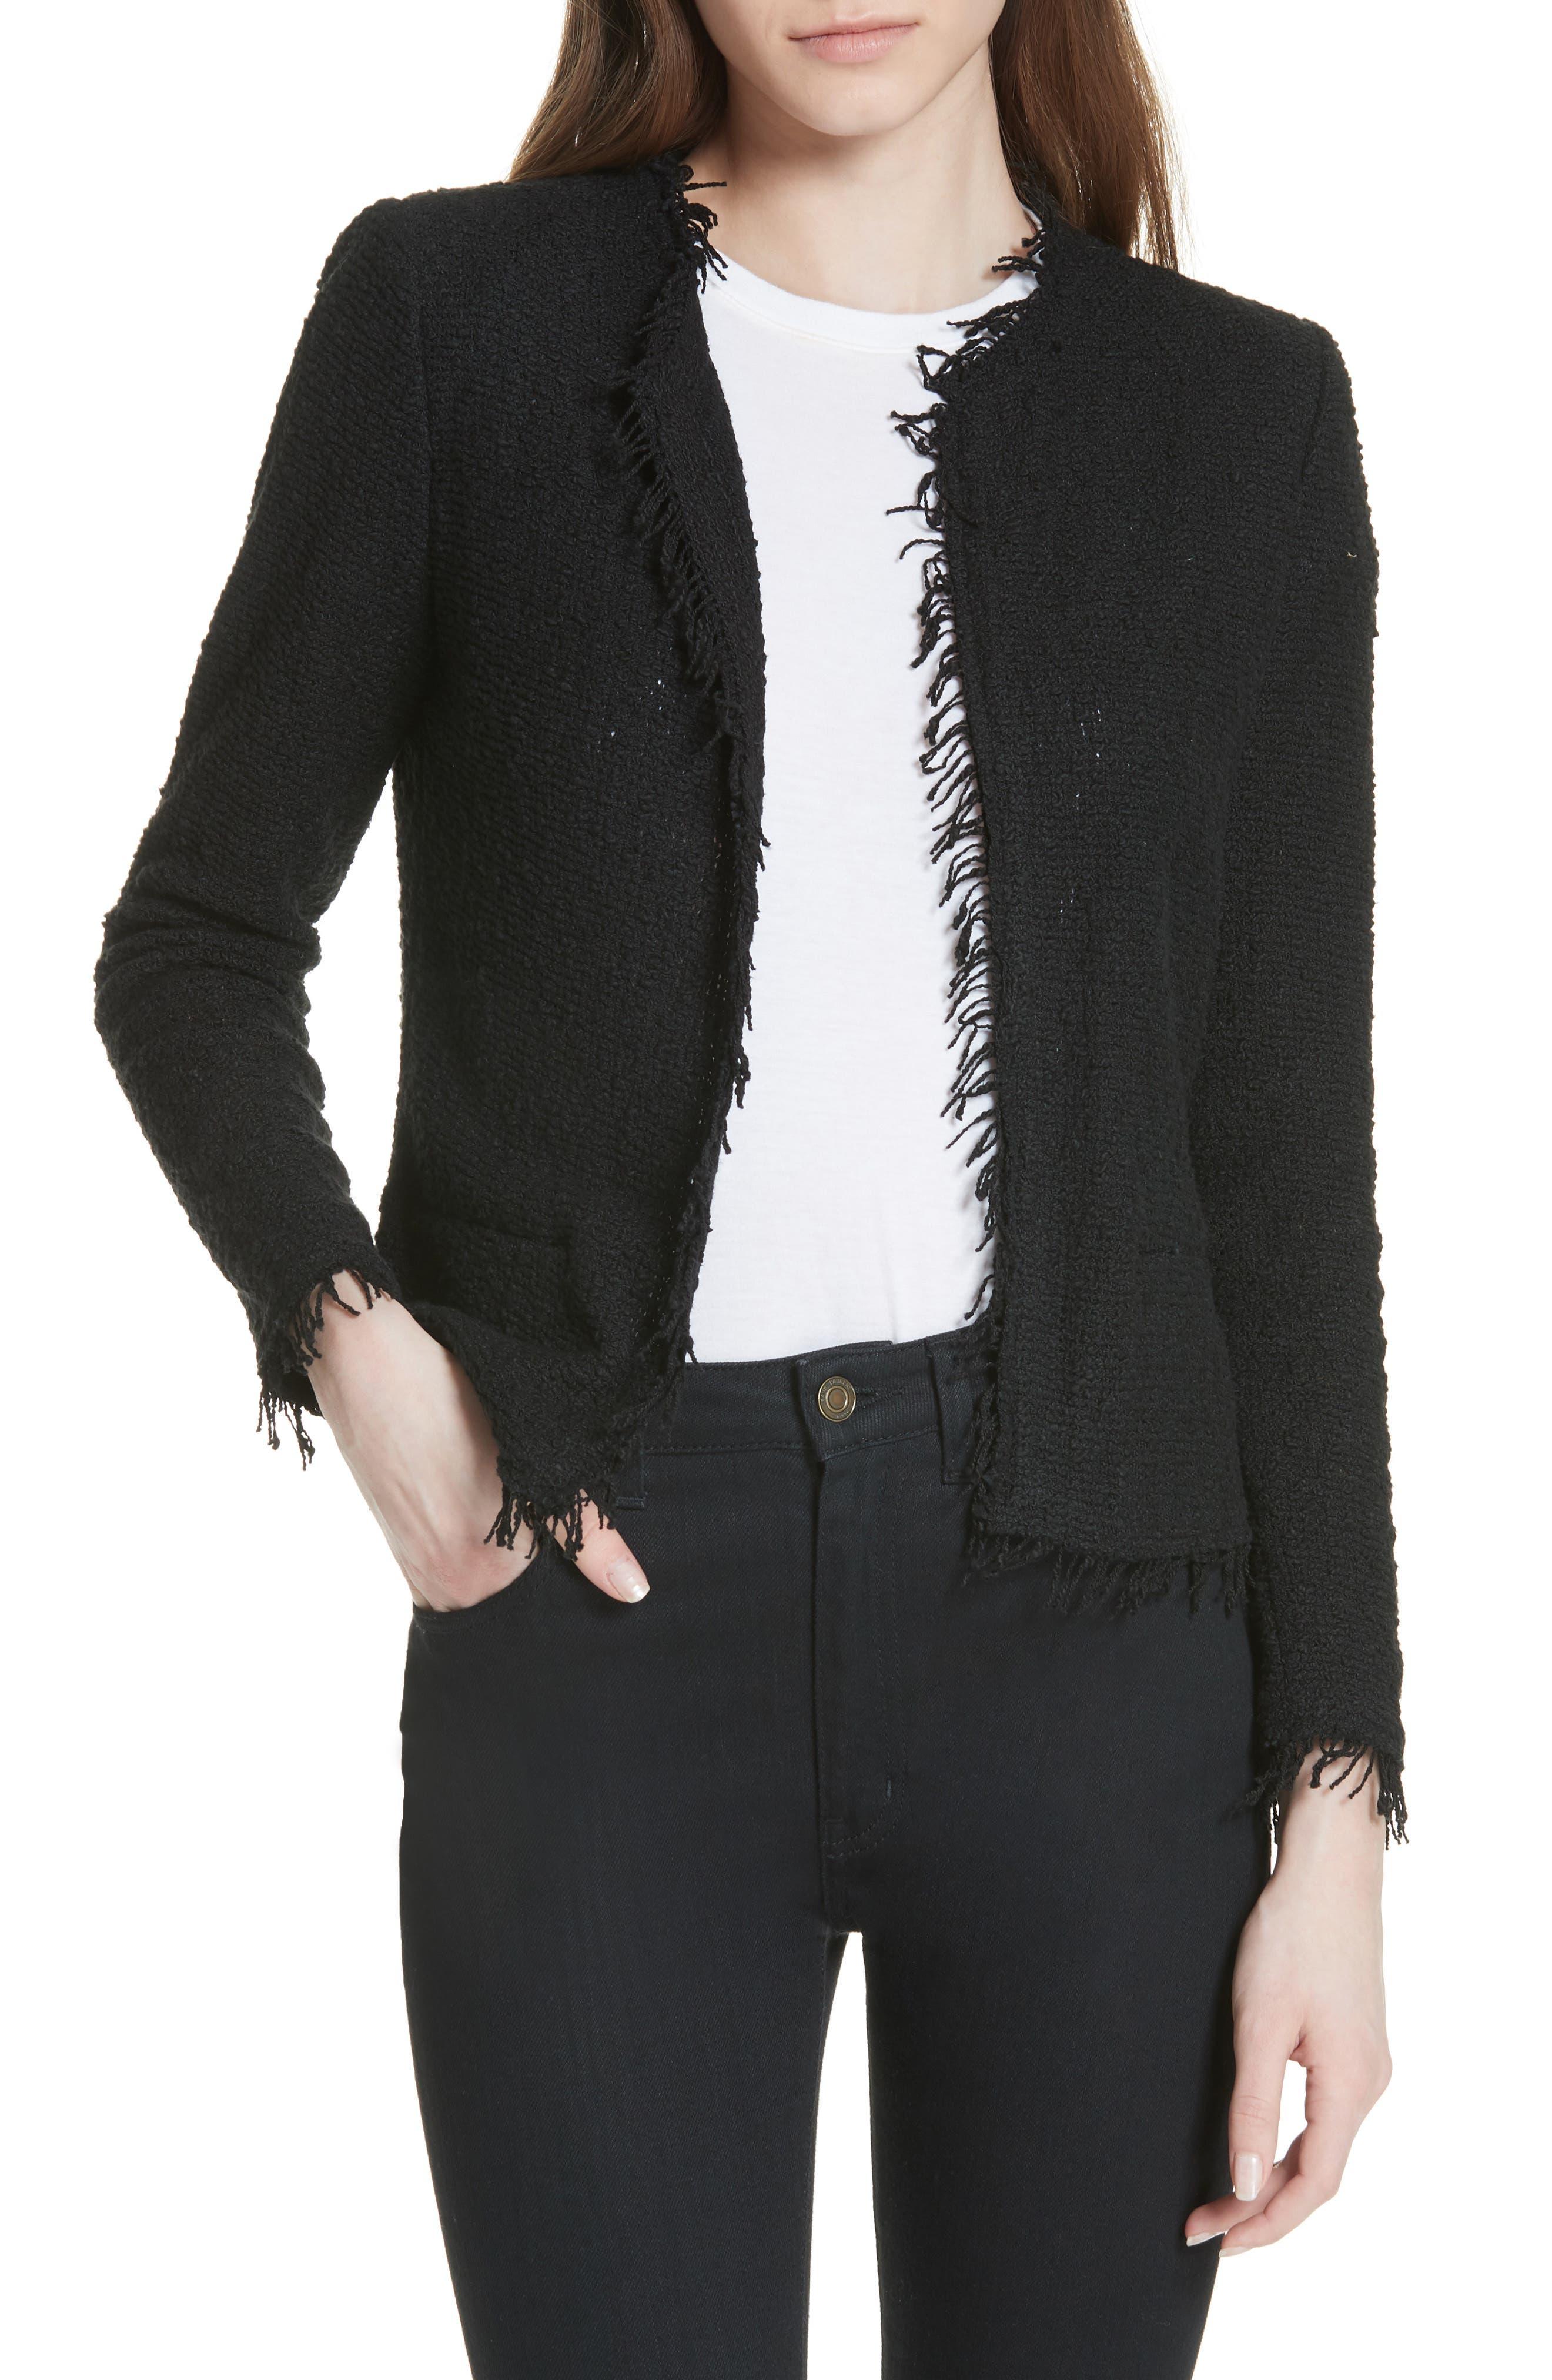 Shavani Tweed Jacket,                             Main thumbnail 1, color,                             001